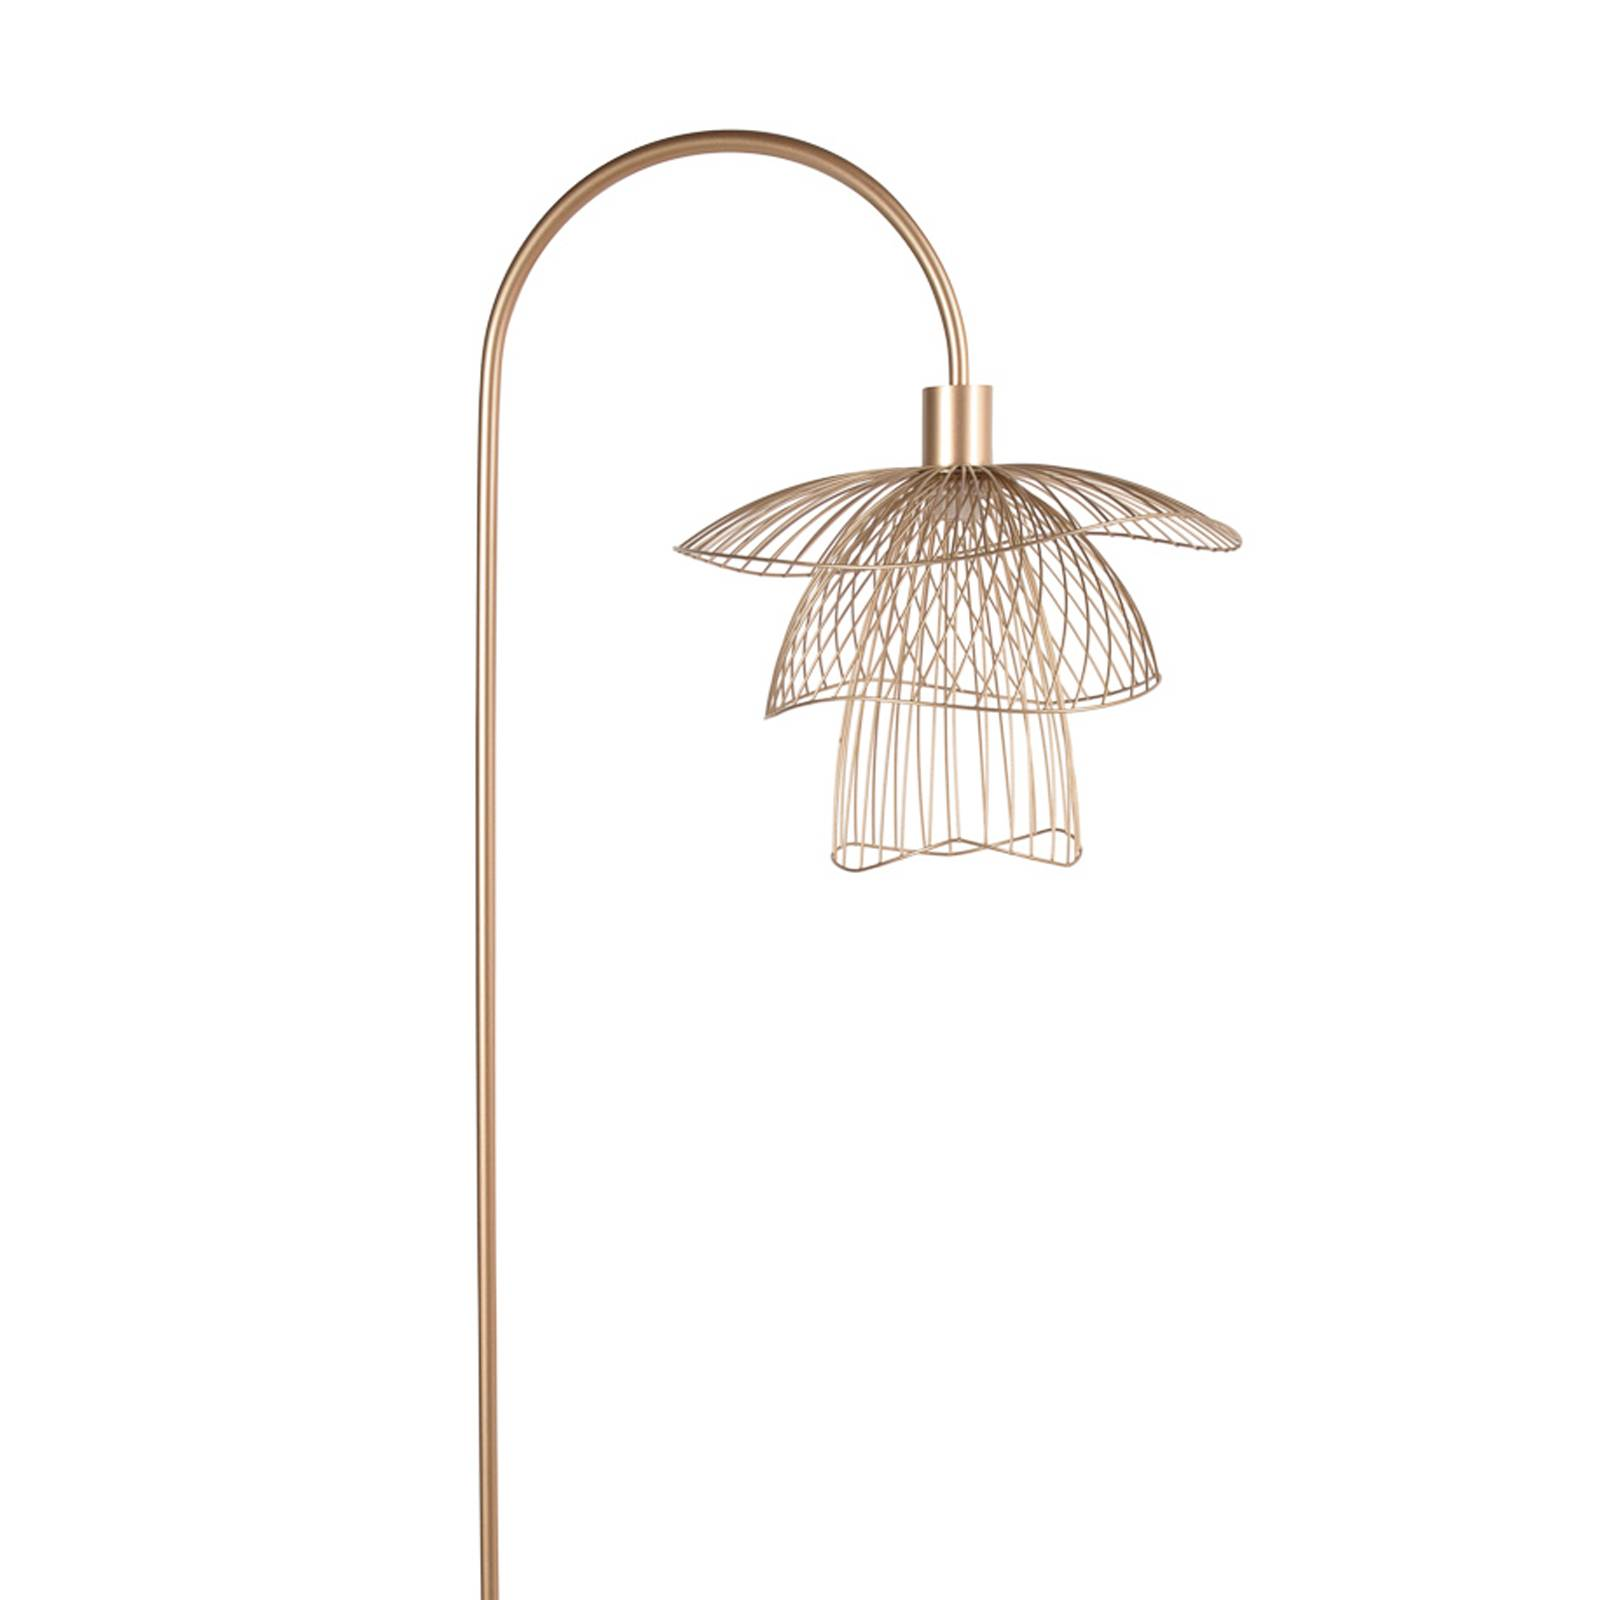 Forestier Papillon lampadaire XS, champagne